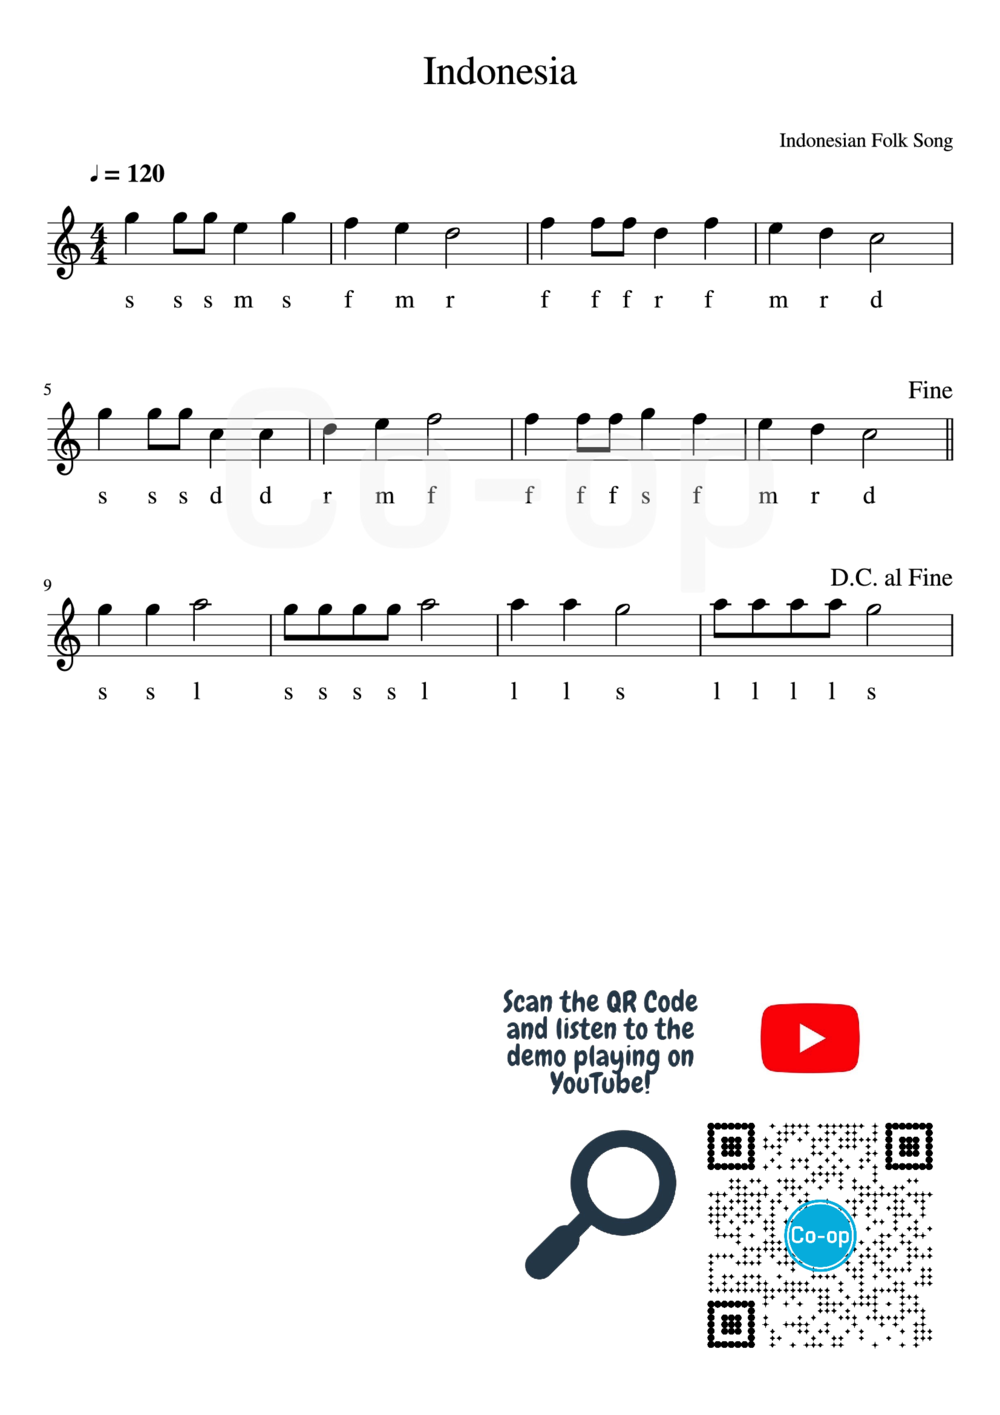 Indonesia | Solfege Notation | Free Sheet Music